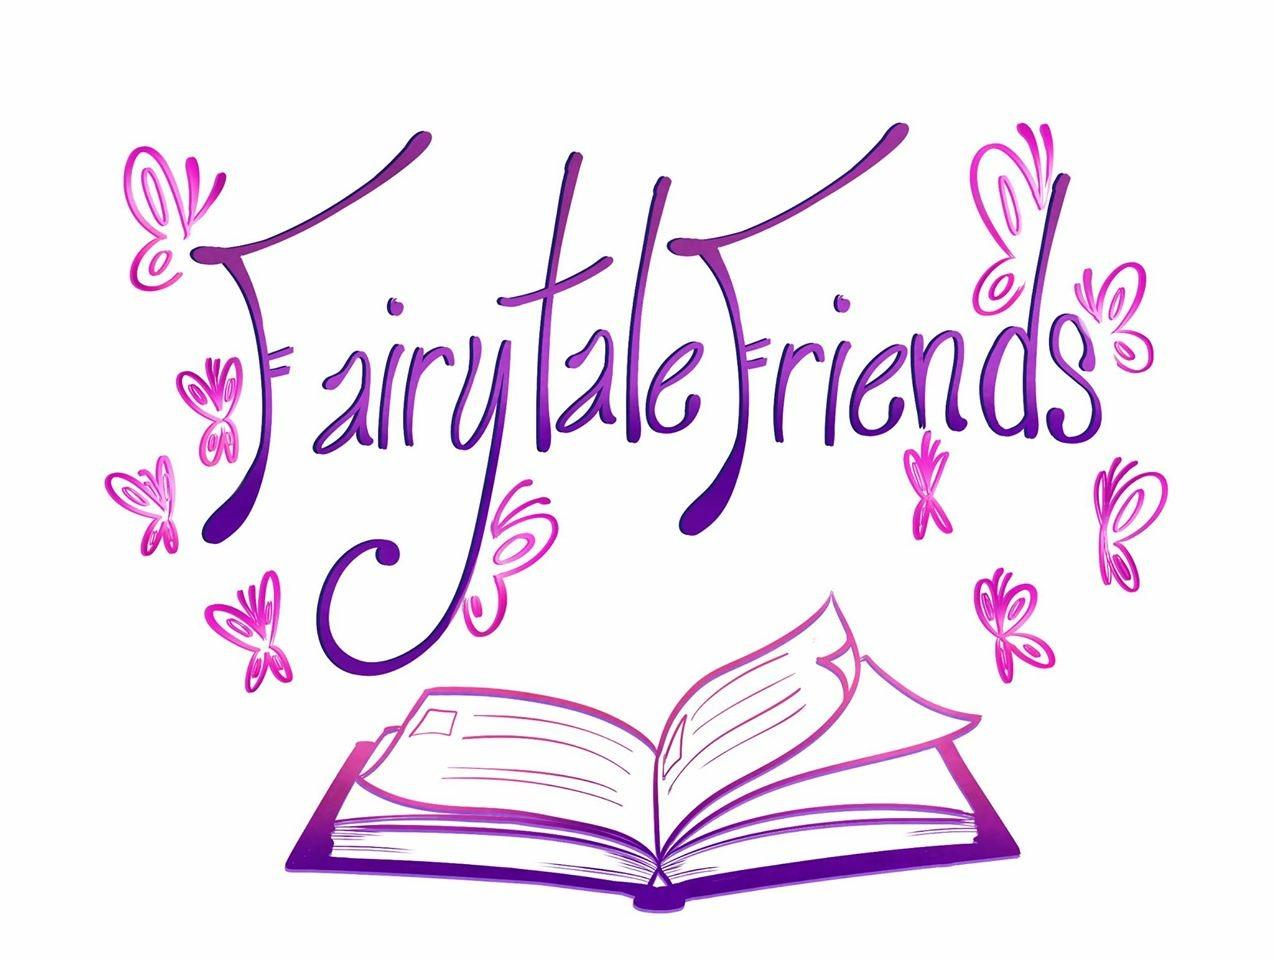 Fairytale Friends Musical Theatre Camp